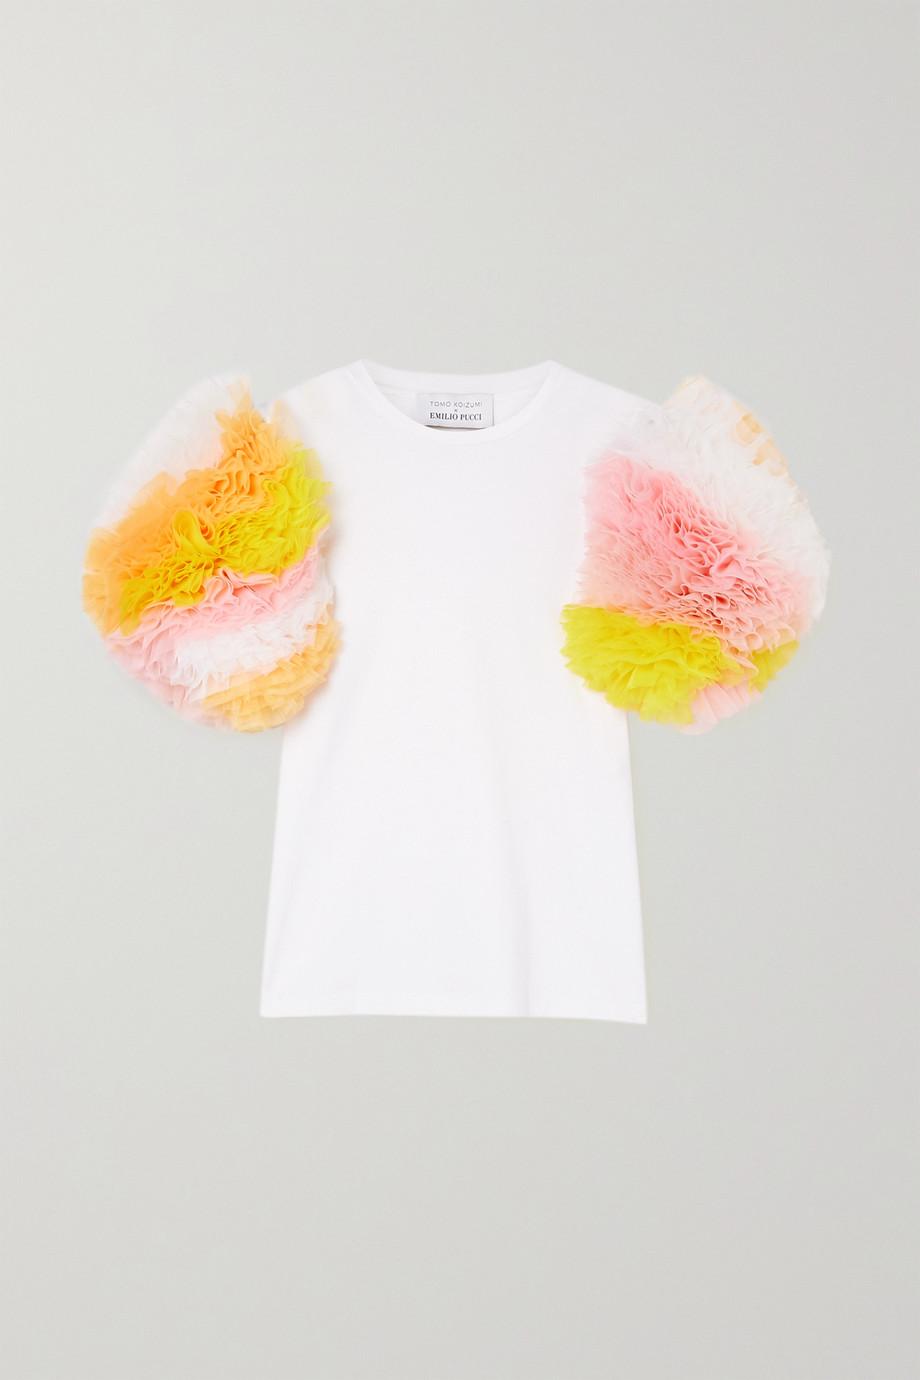 Tomo Koizumi X Emilio Pucci Cotton-jersey and ruffled tulle T-shirt